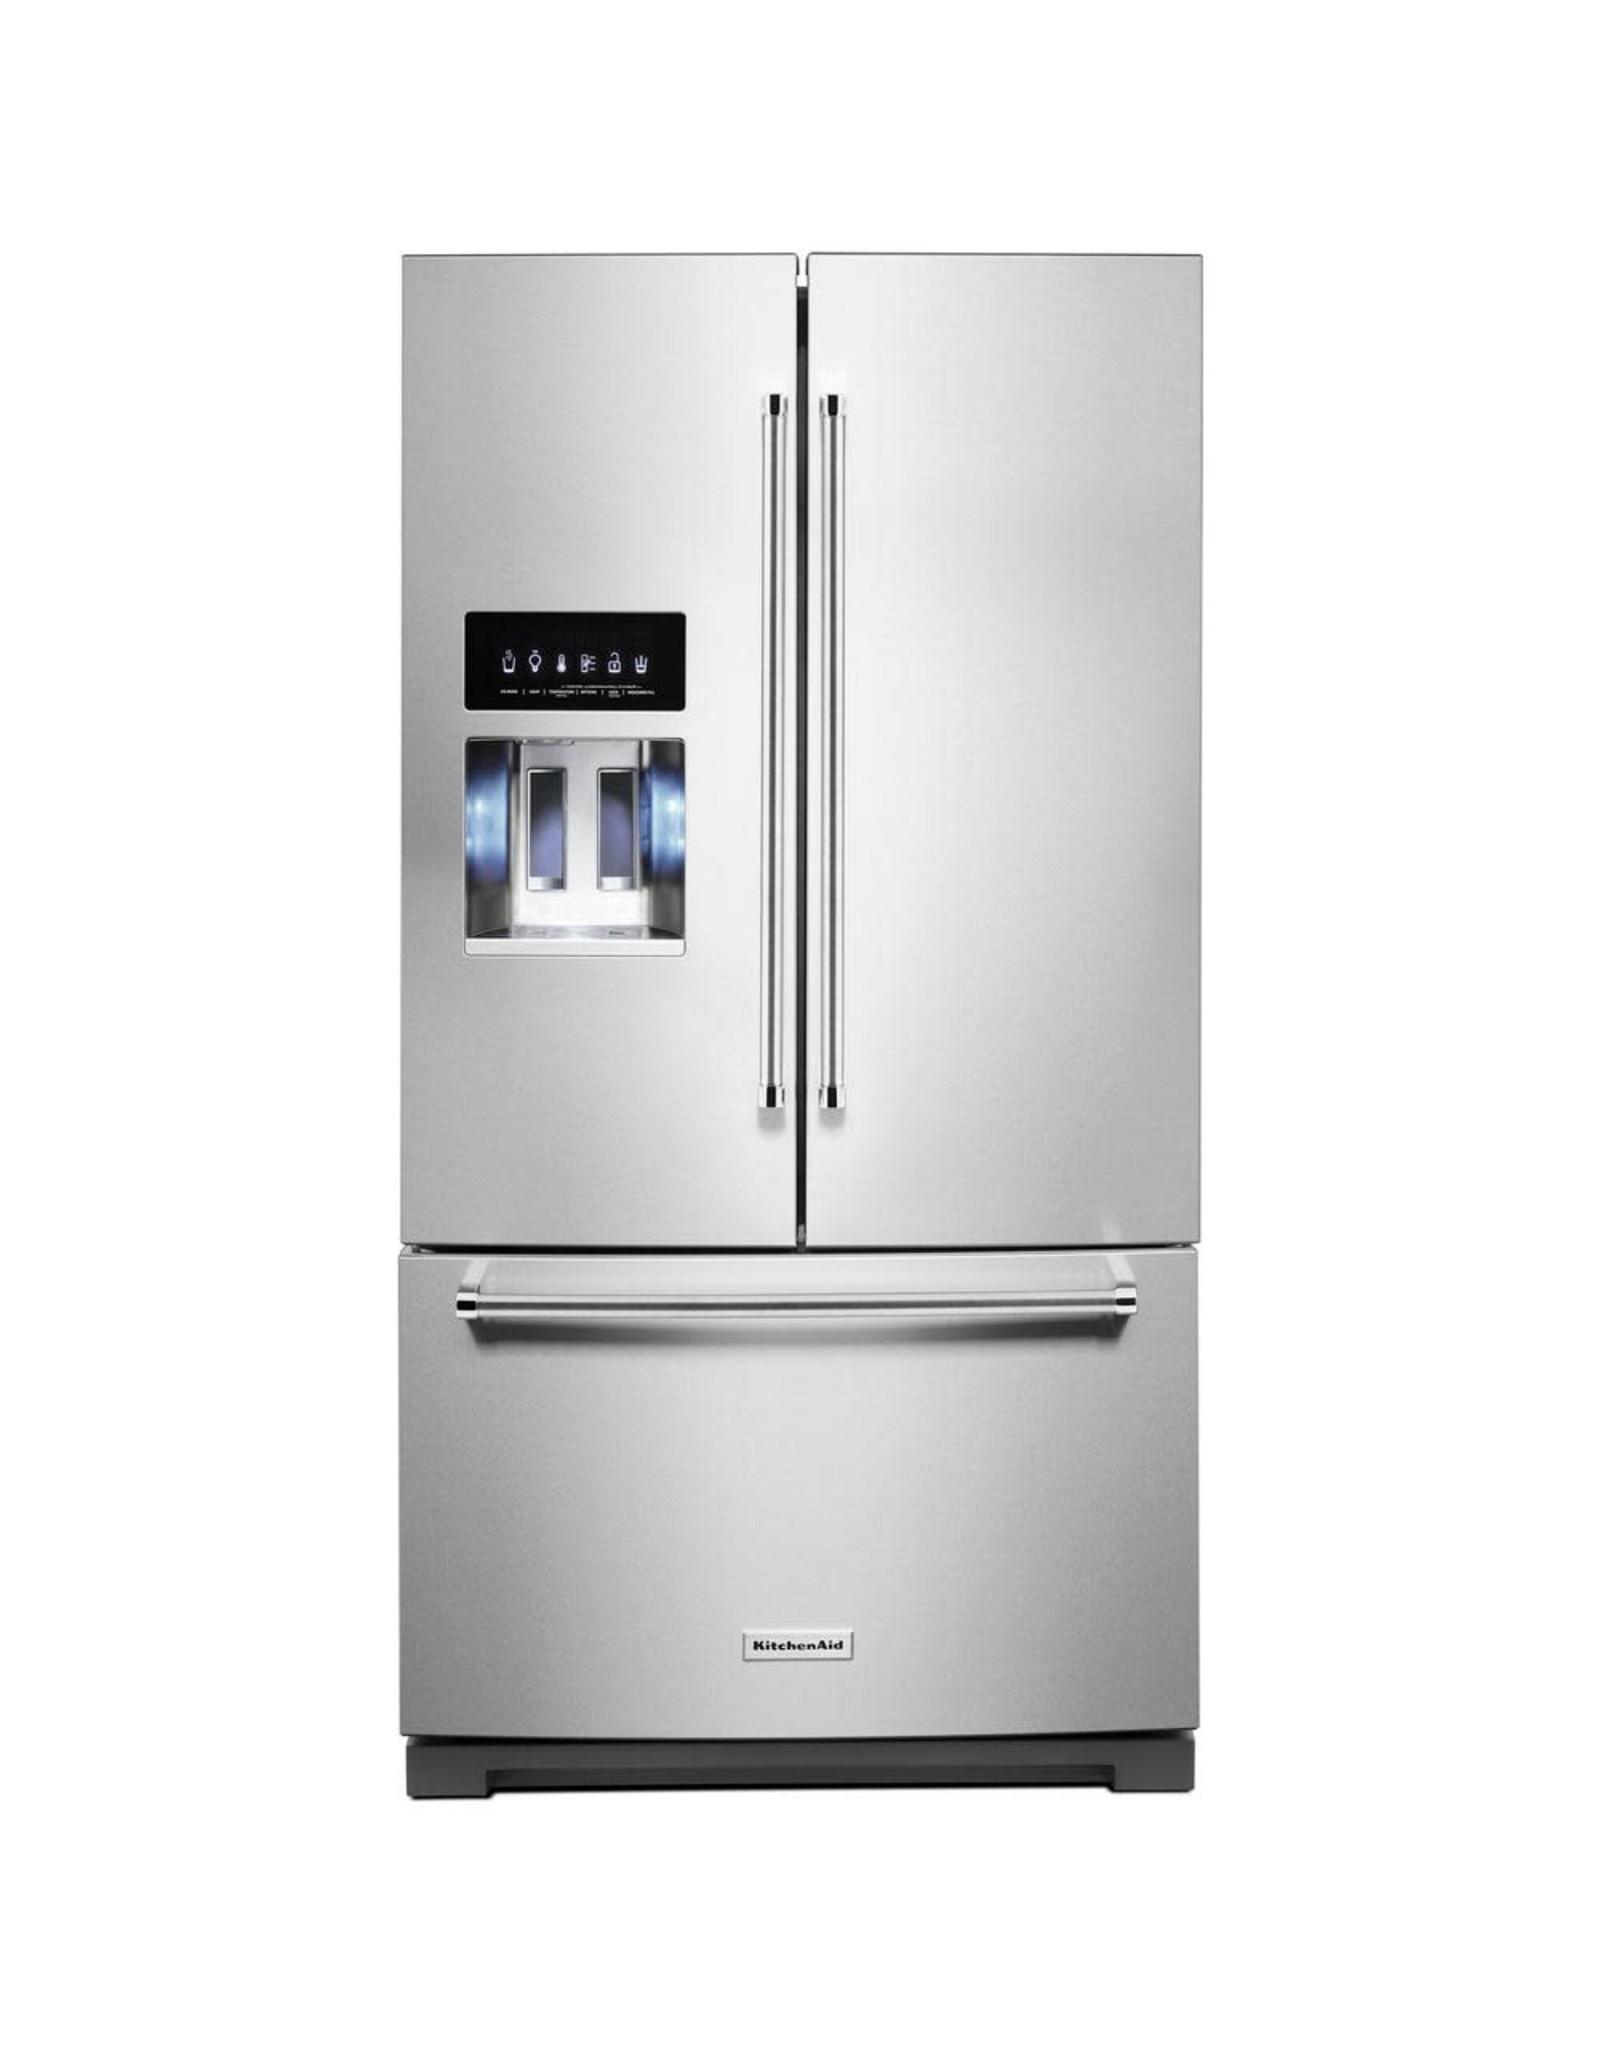 KRFF507HPS KAD No Frost Multi Dr -FreeStandg Refr Frez - 27 CU FT, FRENCH DOOR, LED, IDI, SINGLE